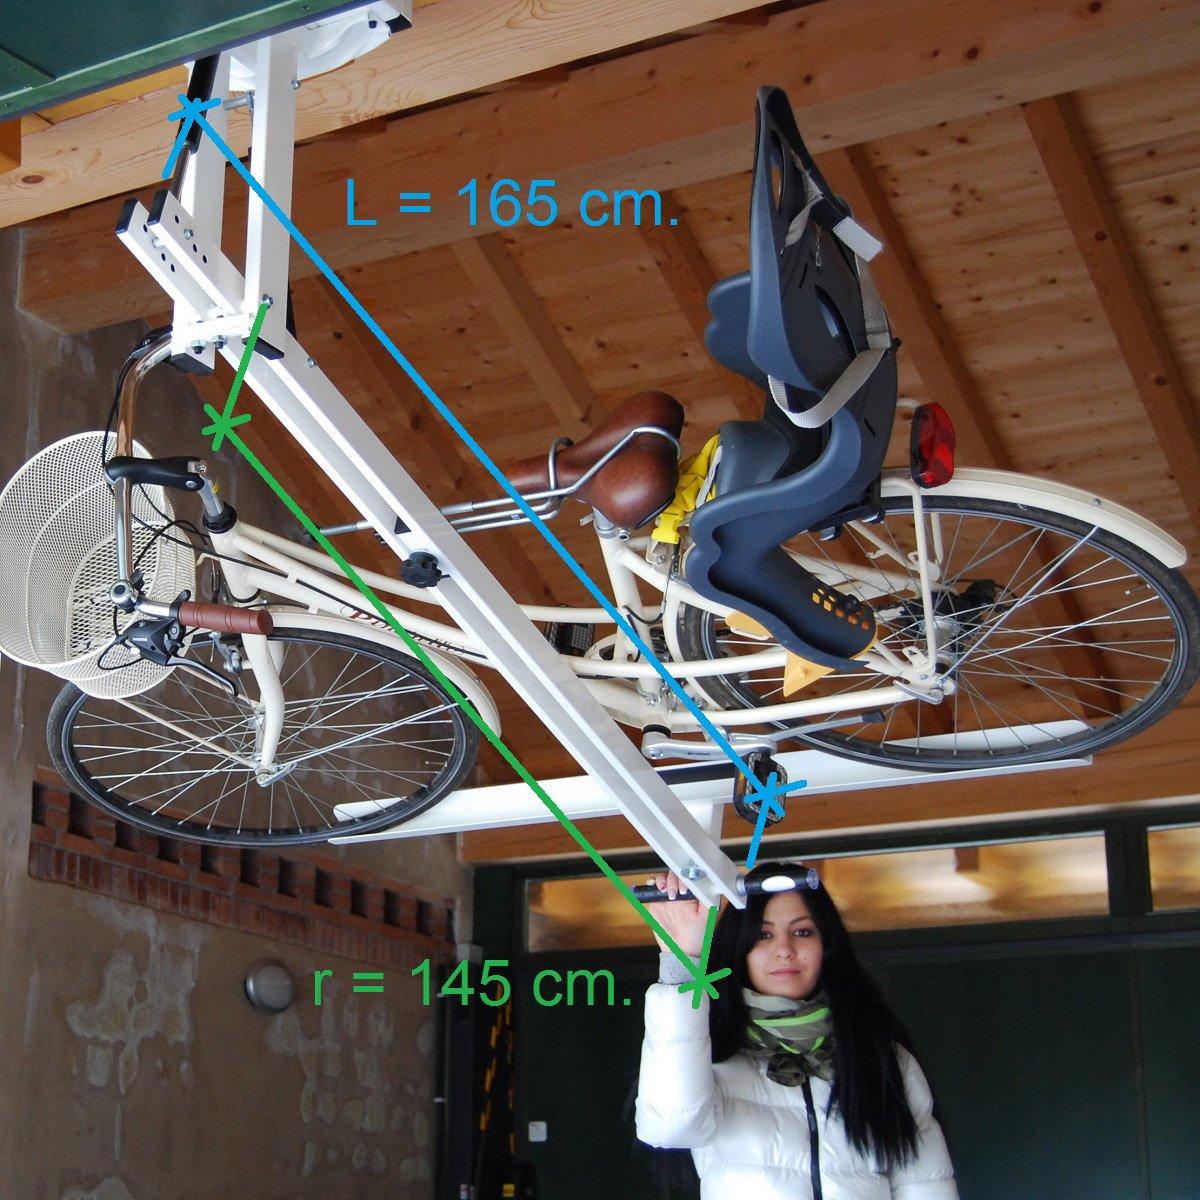 raggio-bici-garage